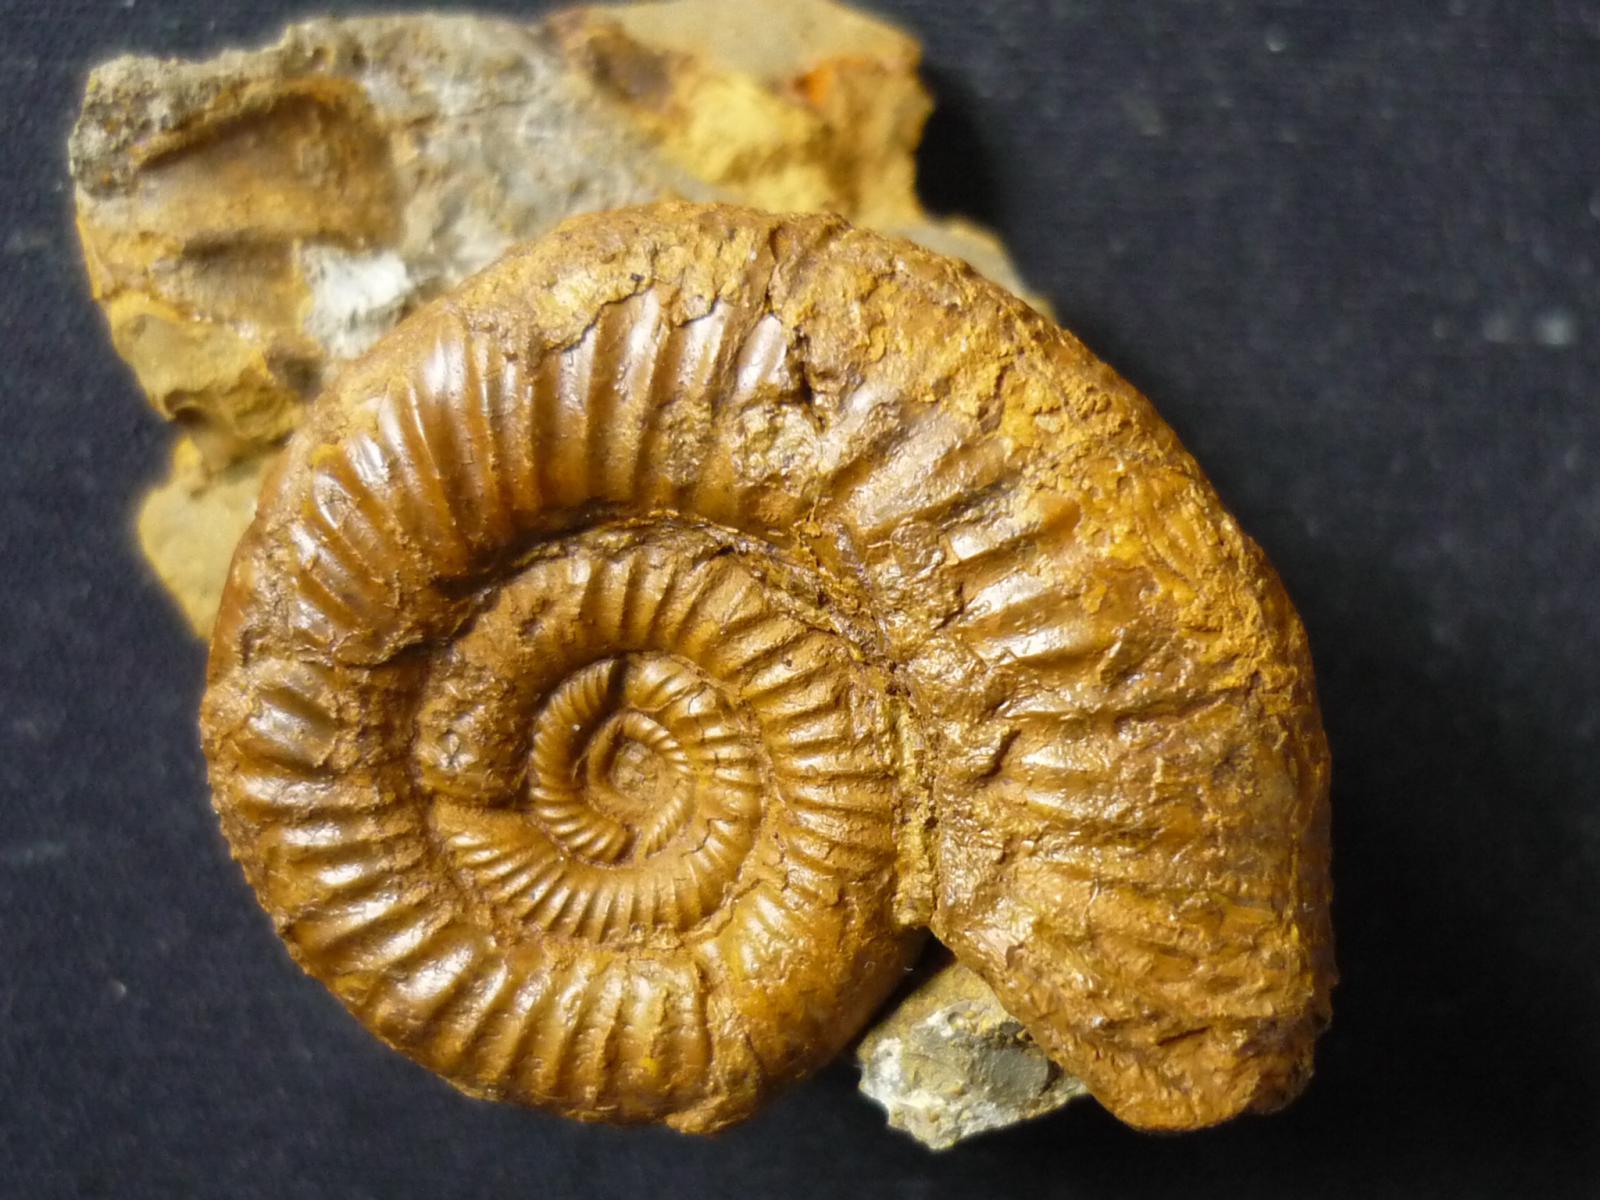 Properisphinctes bernensis (De Loriol 1898)